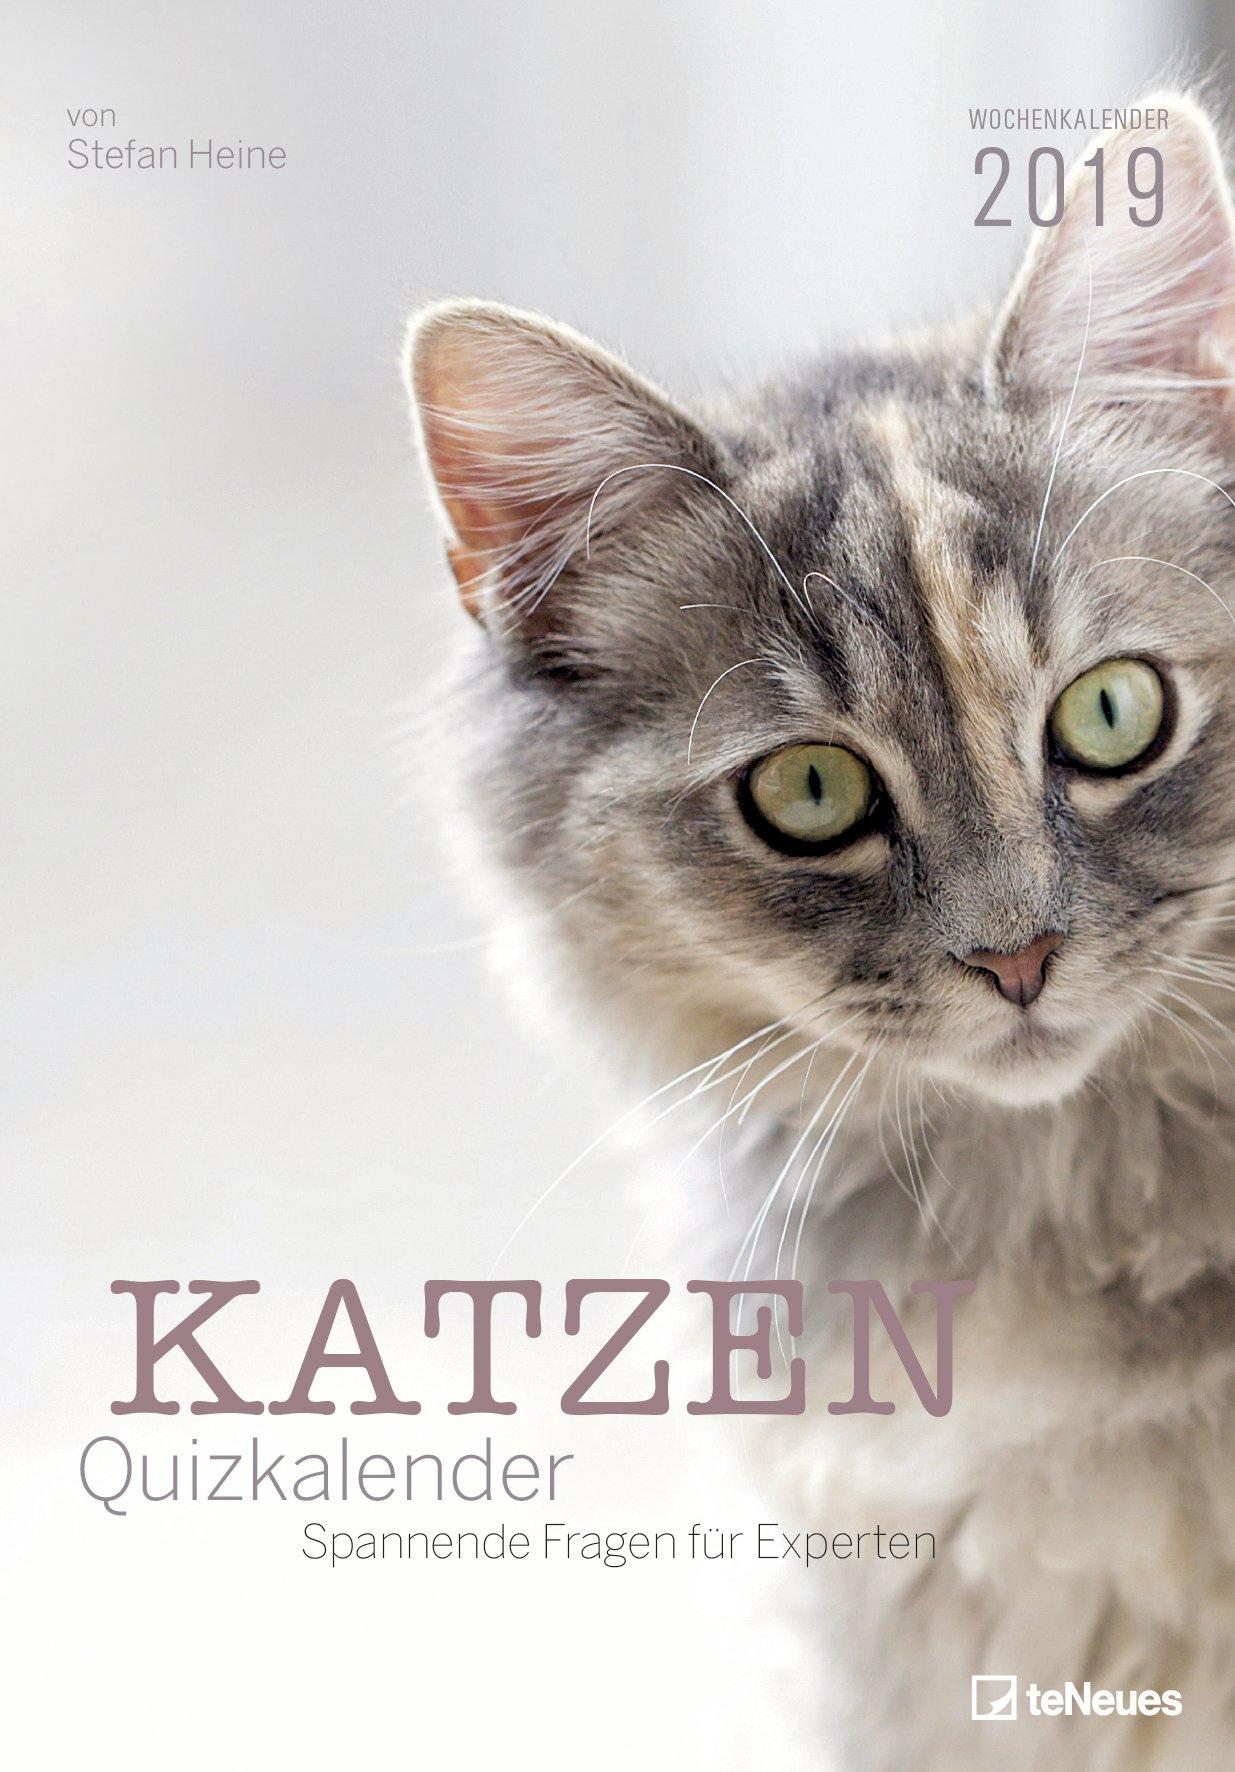 Stefan Heine Katzen-Quiz 2019 Wochenkalender - Rätselkalender, Wandkalender, Tierkalender 2019  -  23,7 x 34 cm